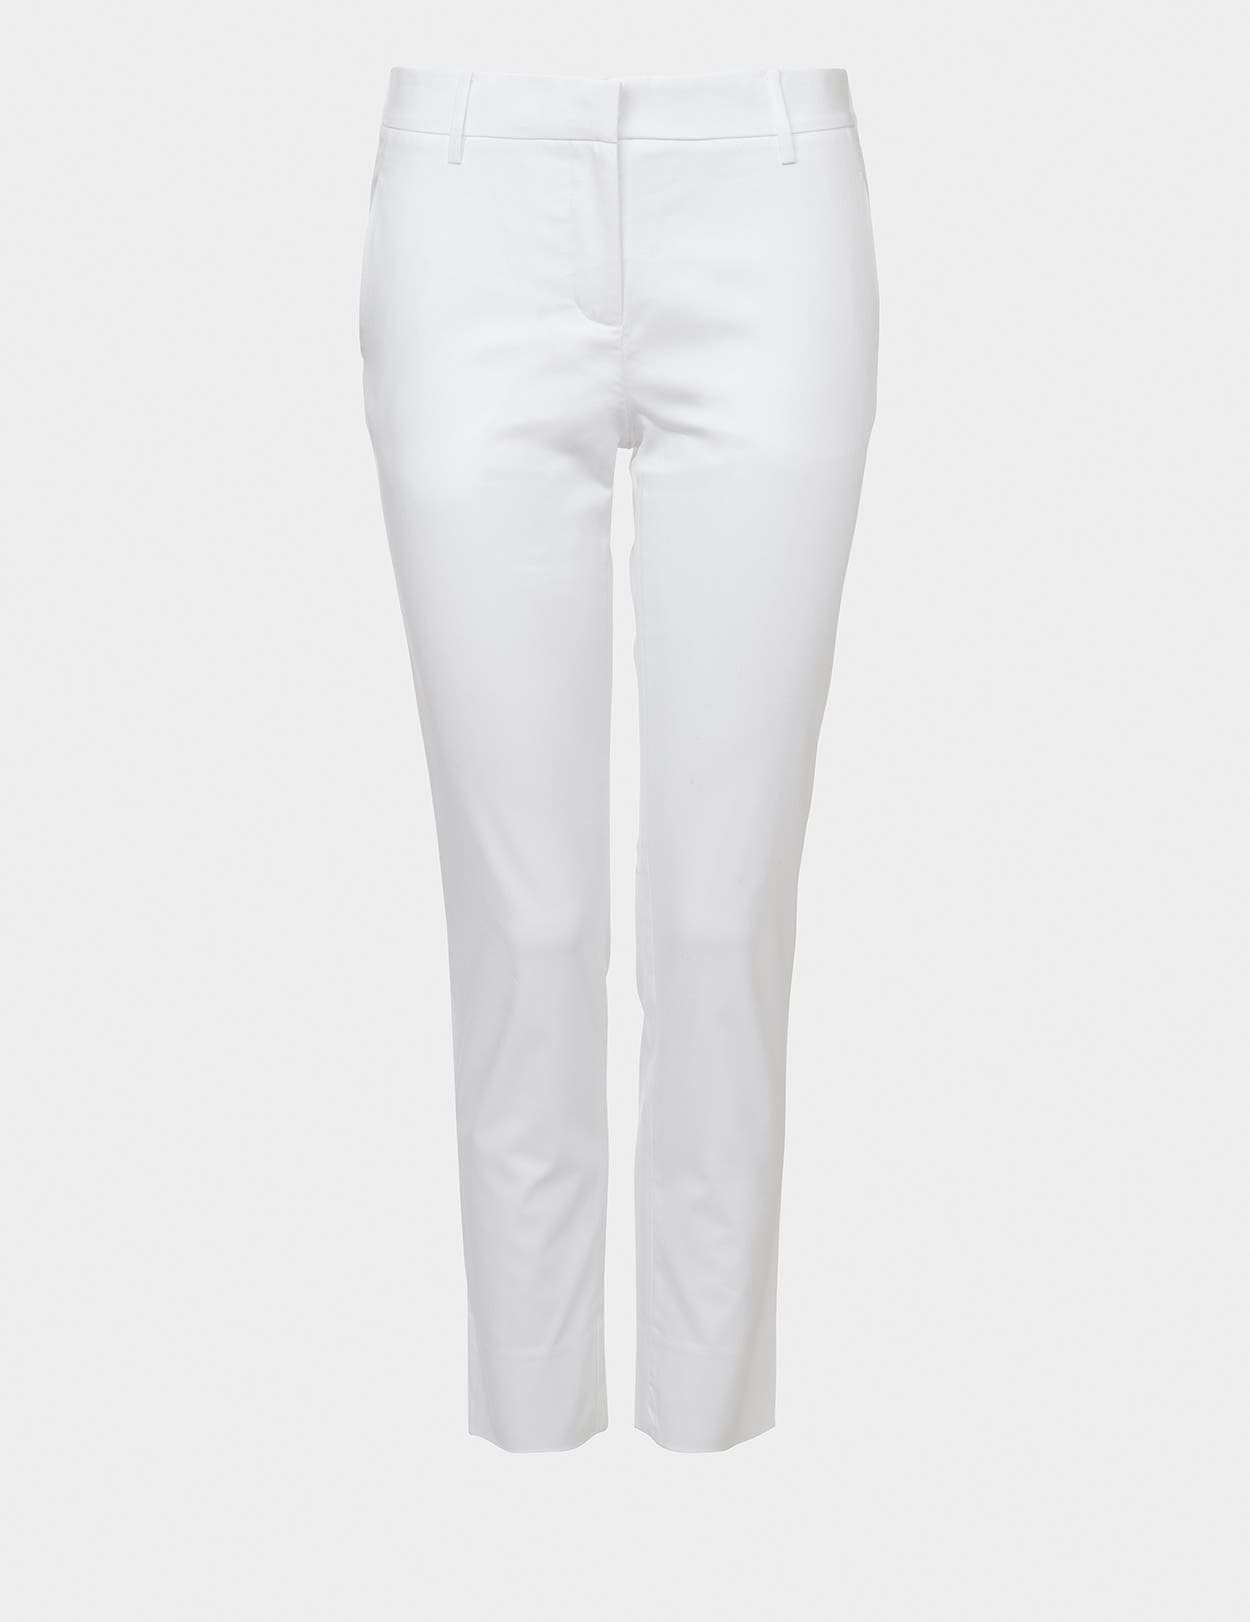 Cotton Twill Straight leg Trouser